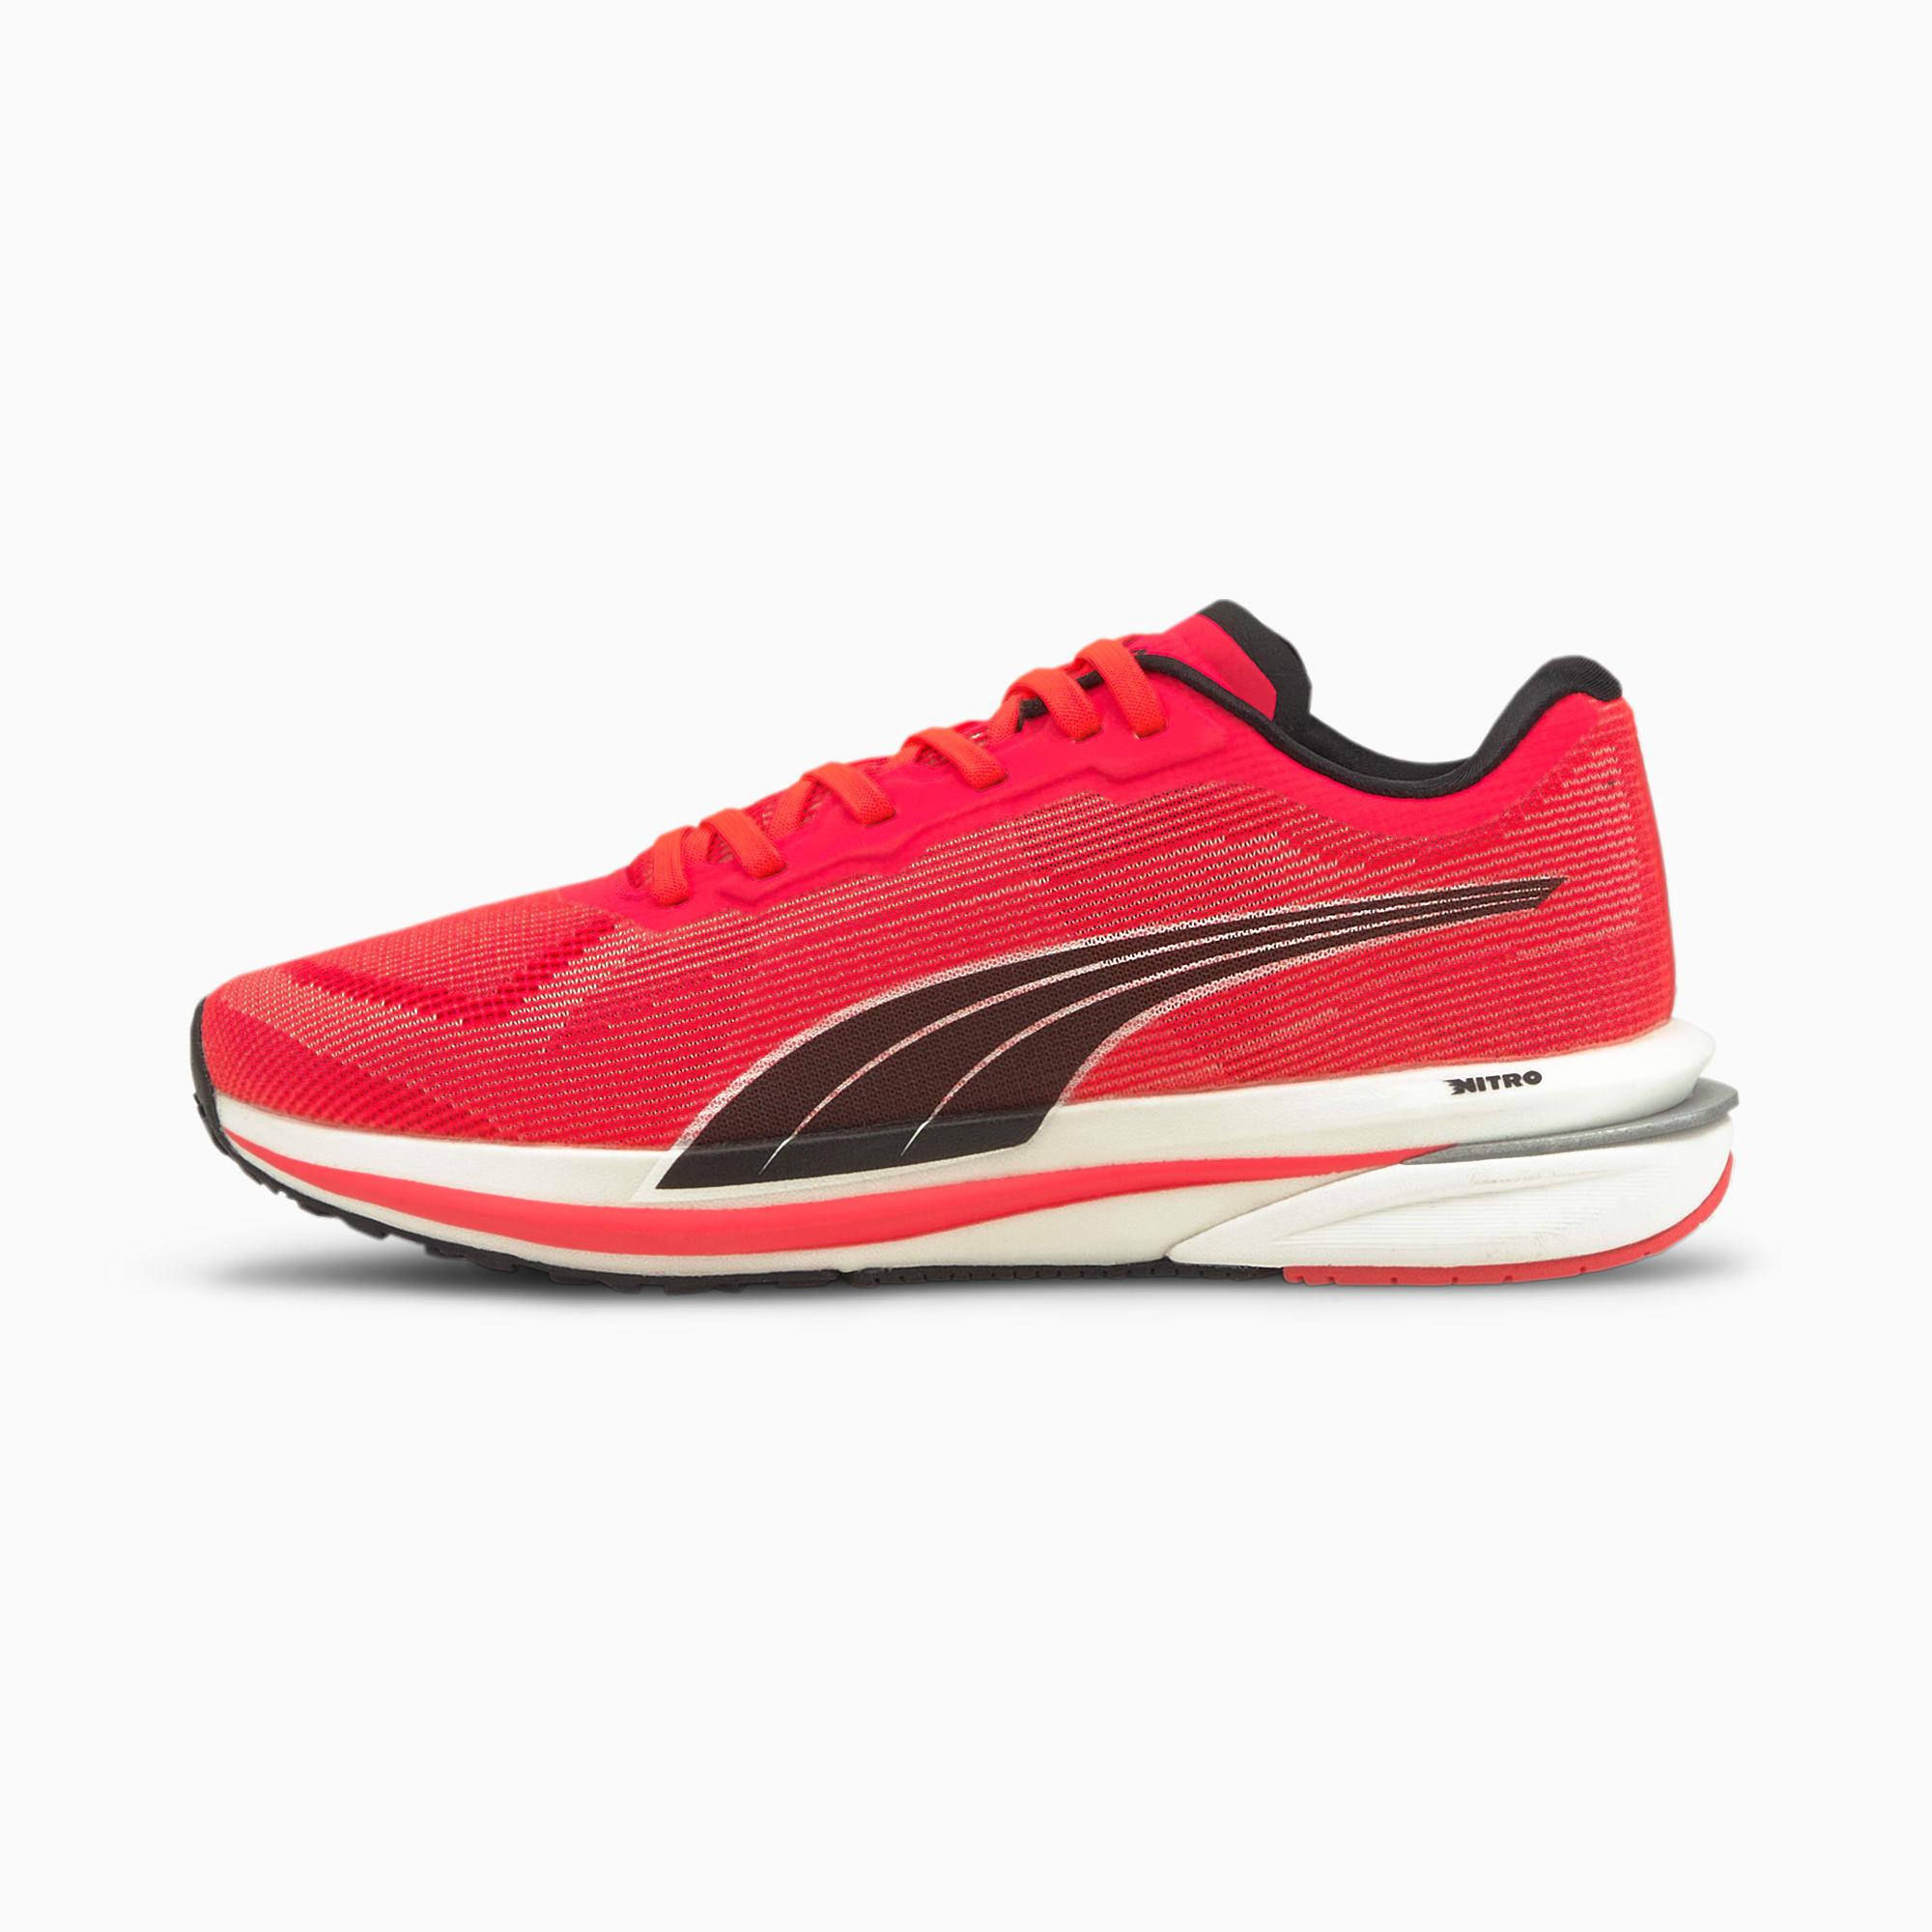 Zapatillas de Running Para Mujer Velocity Nitro, Negro/Blanco, Talla 42 | PUMA Mujeres